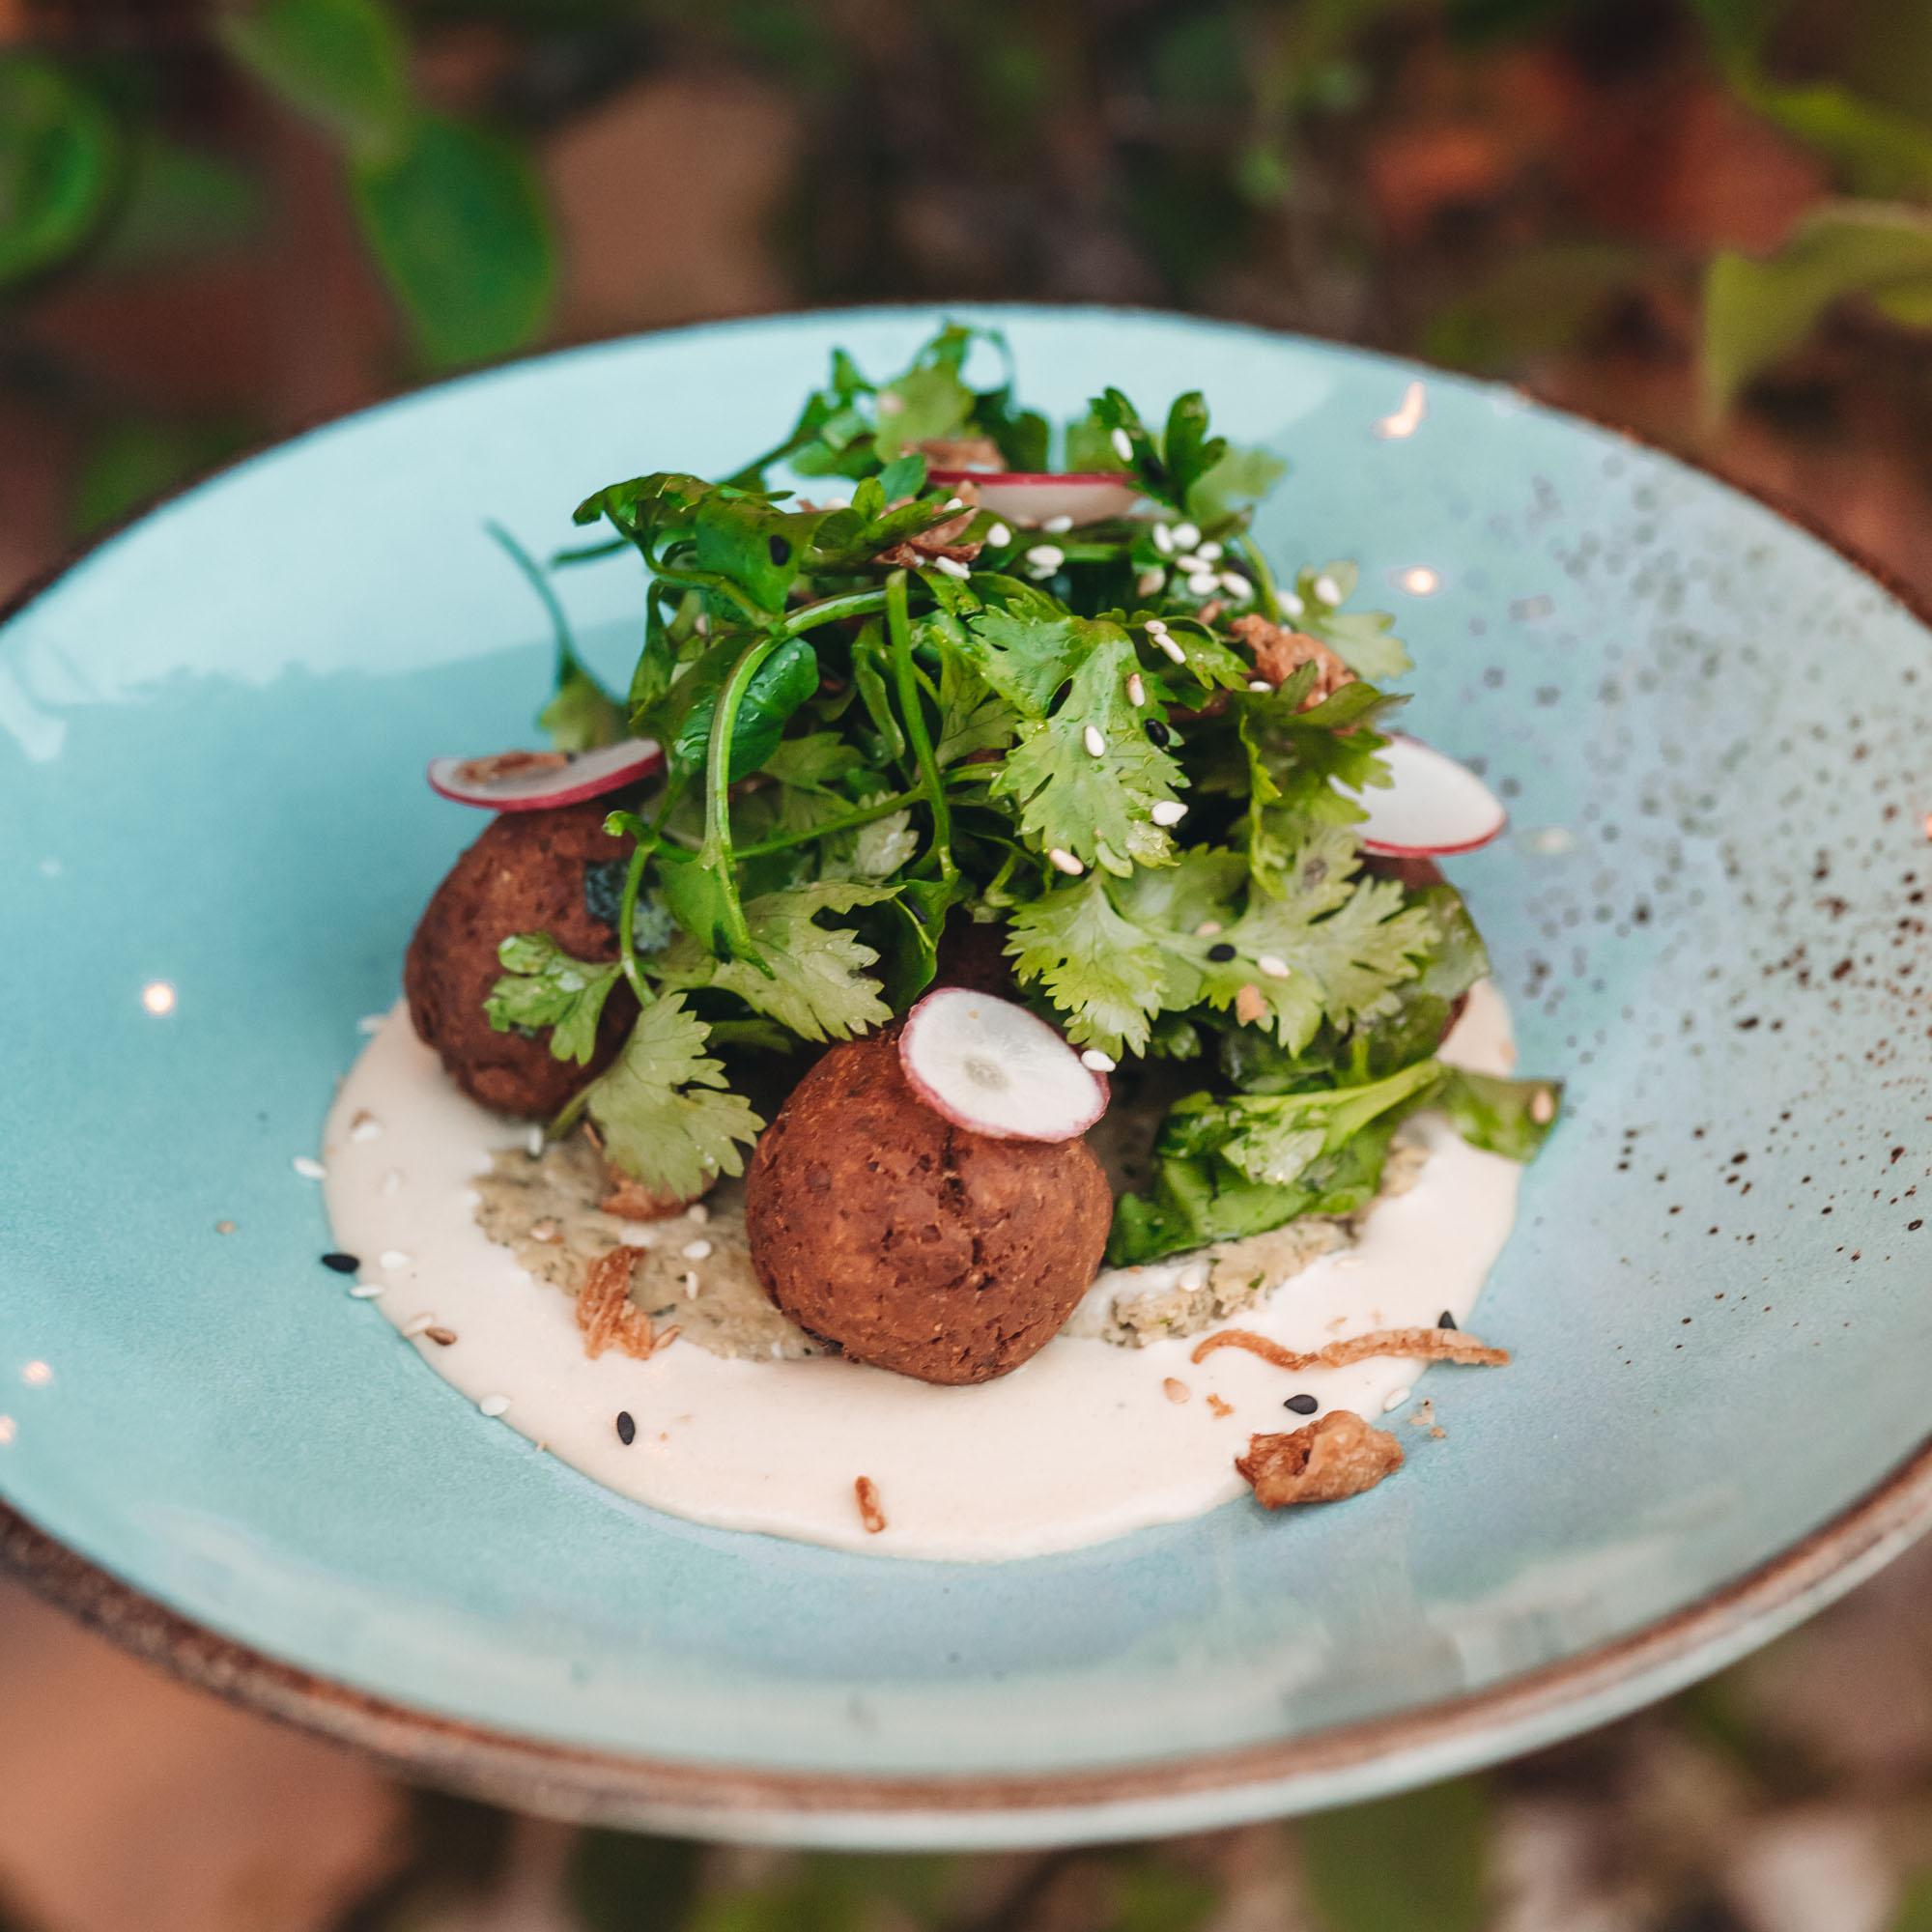 keira-mason-the-common-falafel.jpg